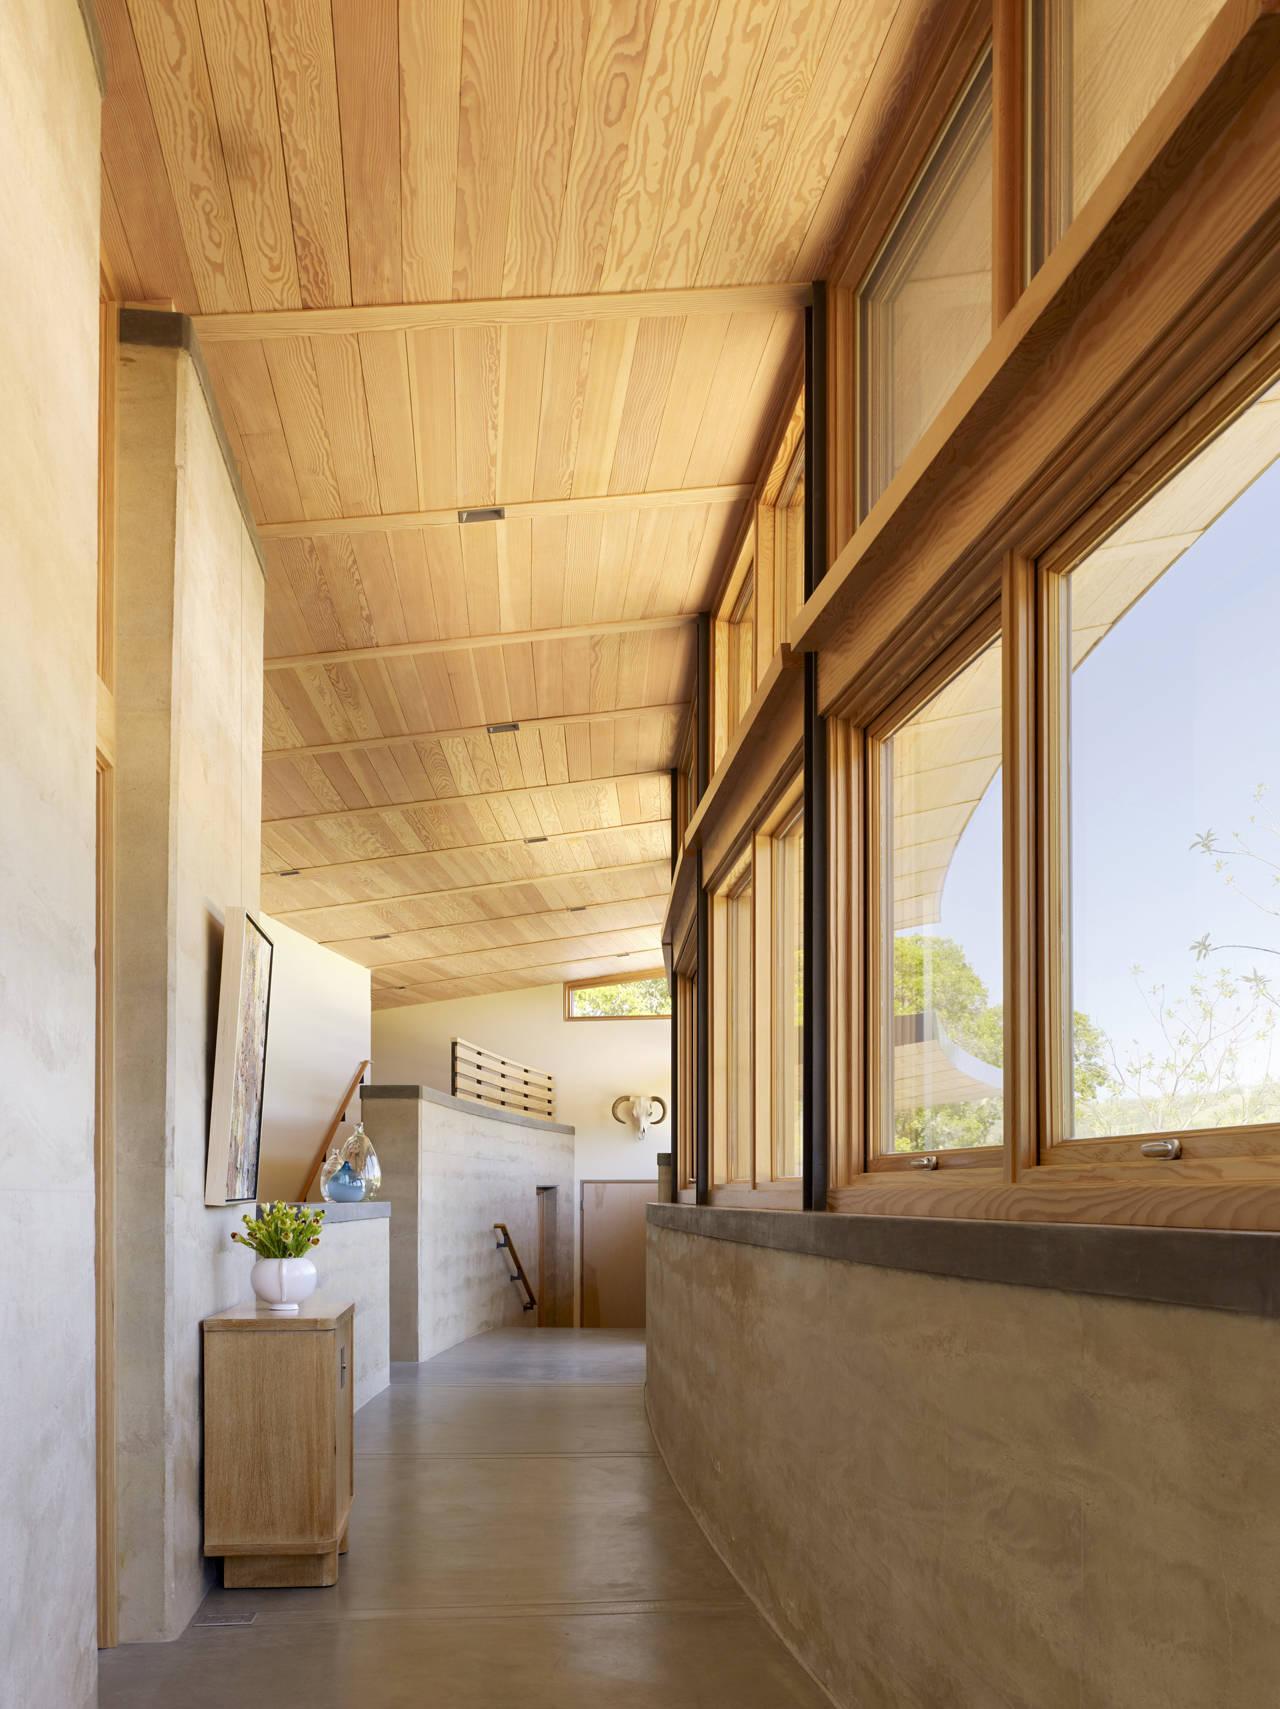 Hallway, Exposed Concrete Walls, Caterpillar House in Carmel, California by Feldman Architecture